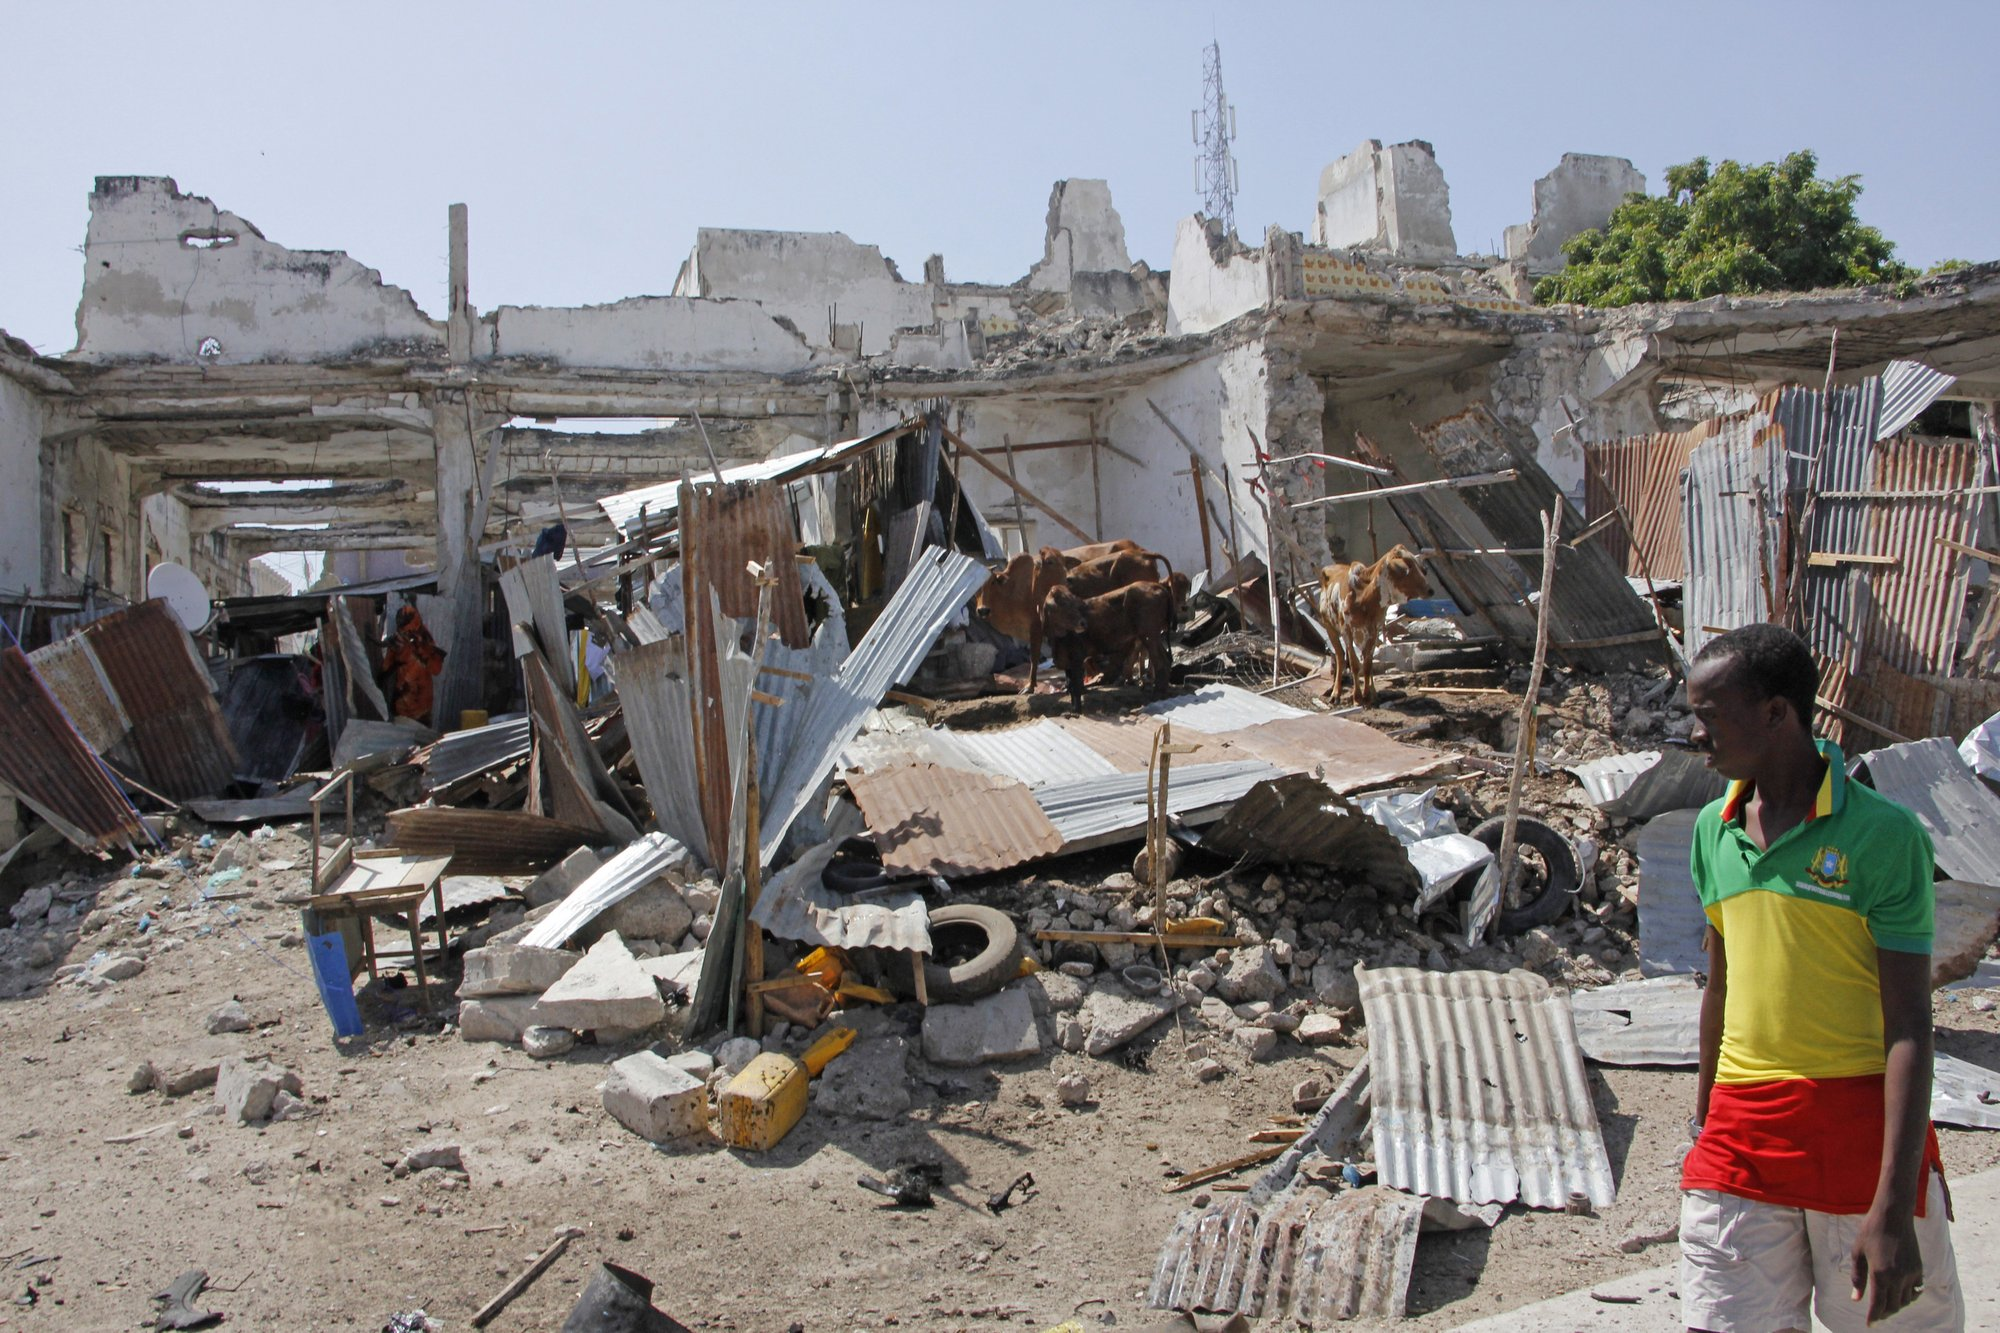 At least 8 killed in twin blasts in Mogadishu: police